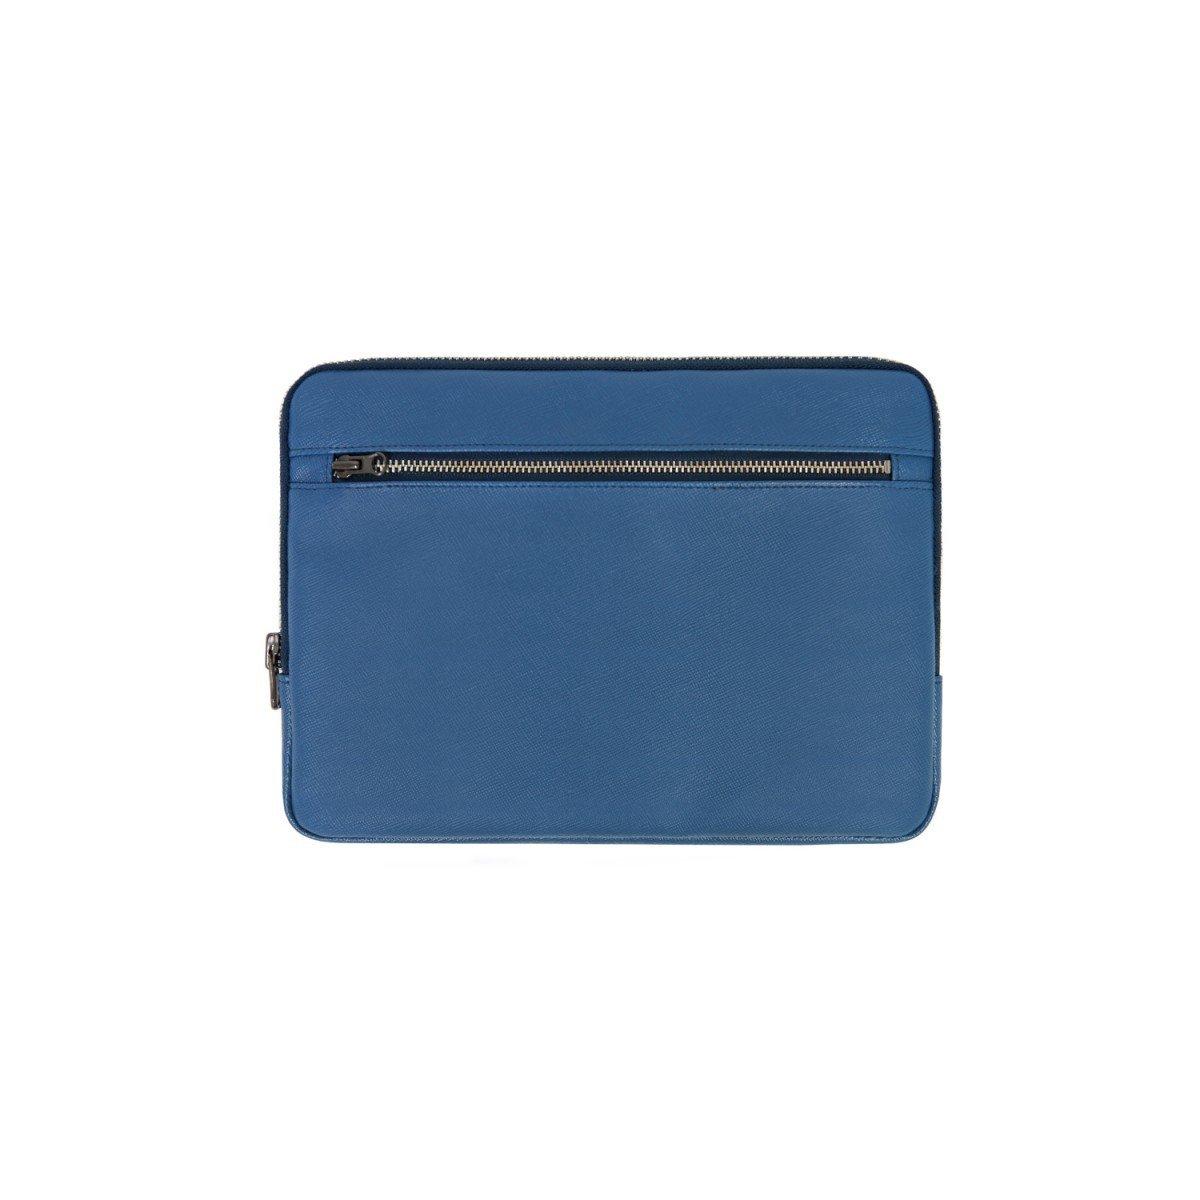 m.Humming Storage Bag Ver.2 手提袋 - Royal blue